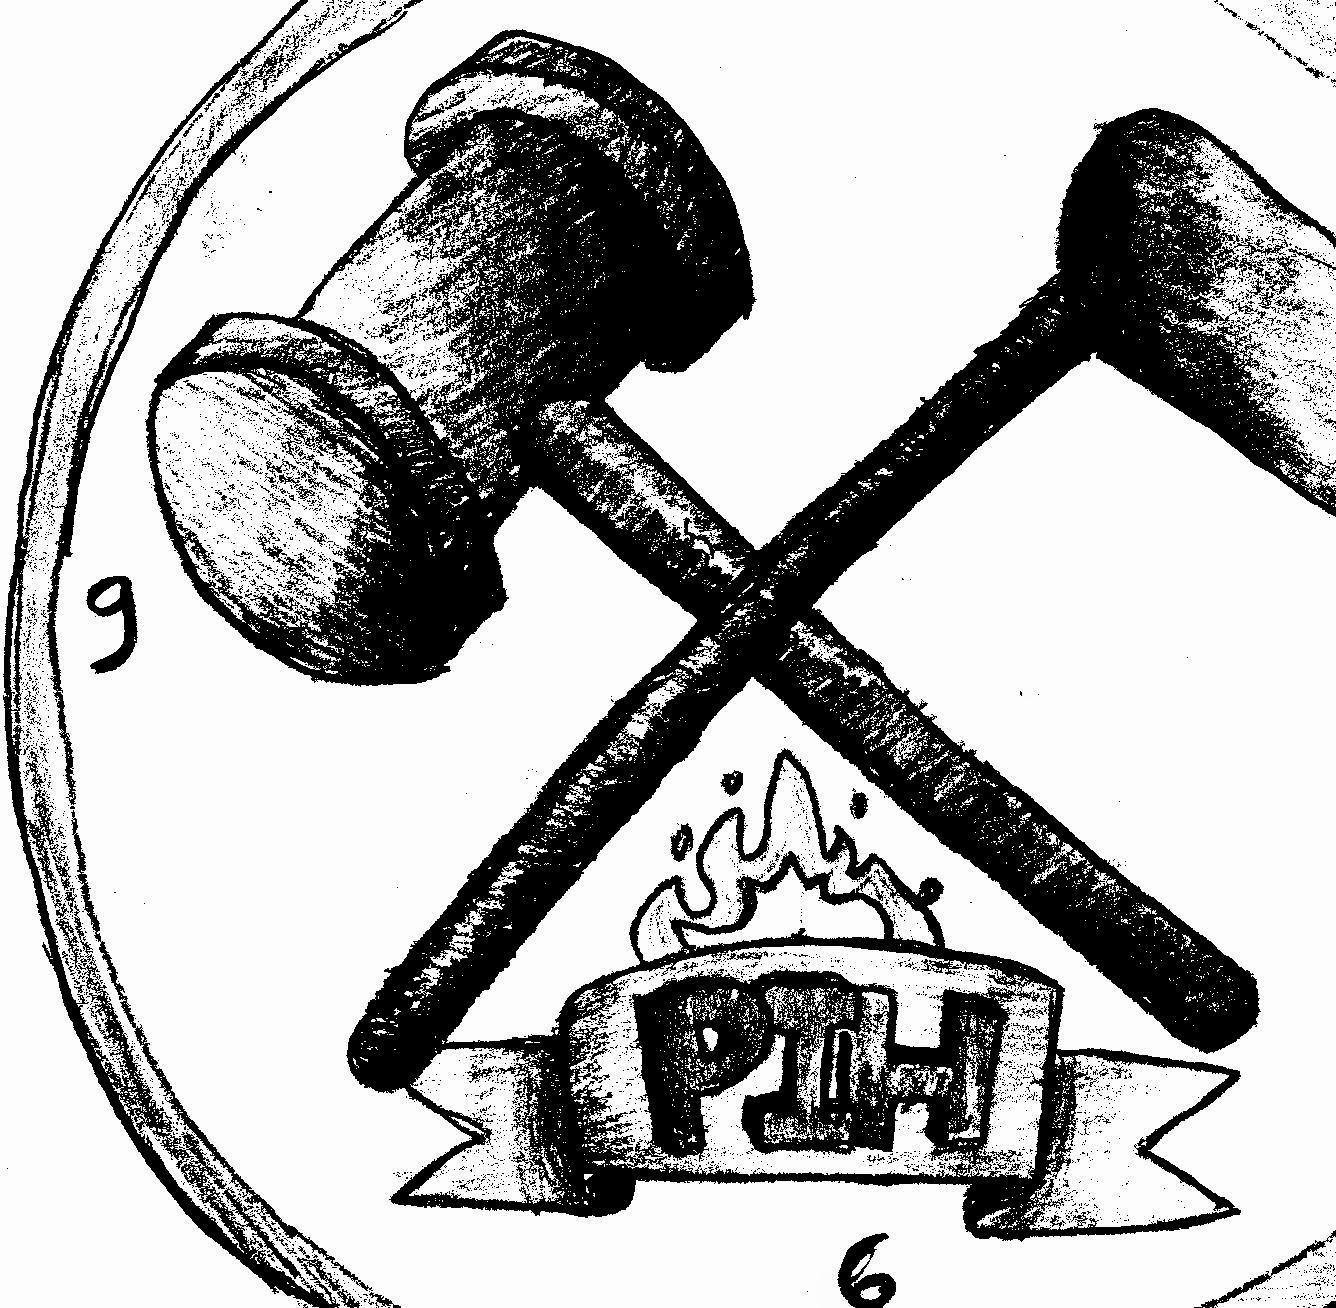 Gambar Wallpaper Ilustrasi Bayangan Hitam Logo Desain Grafis Bersama Jamban